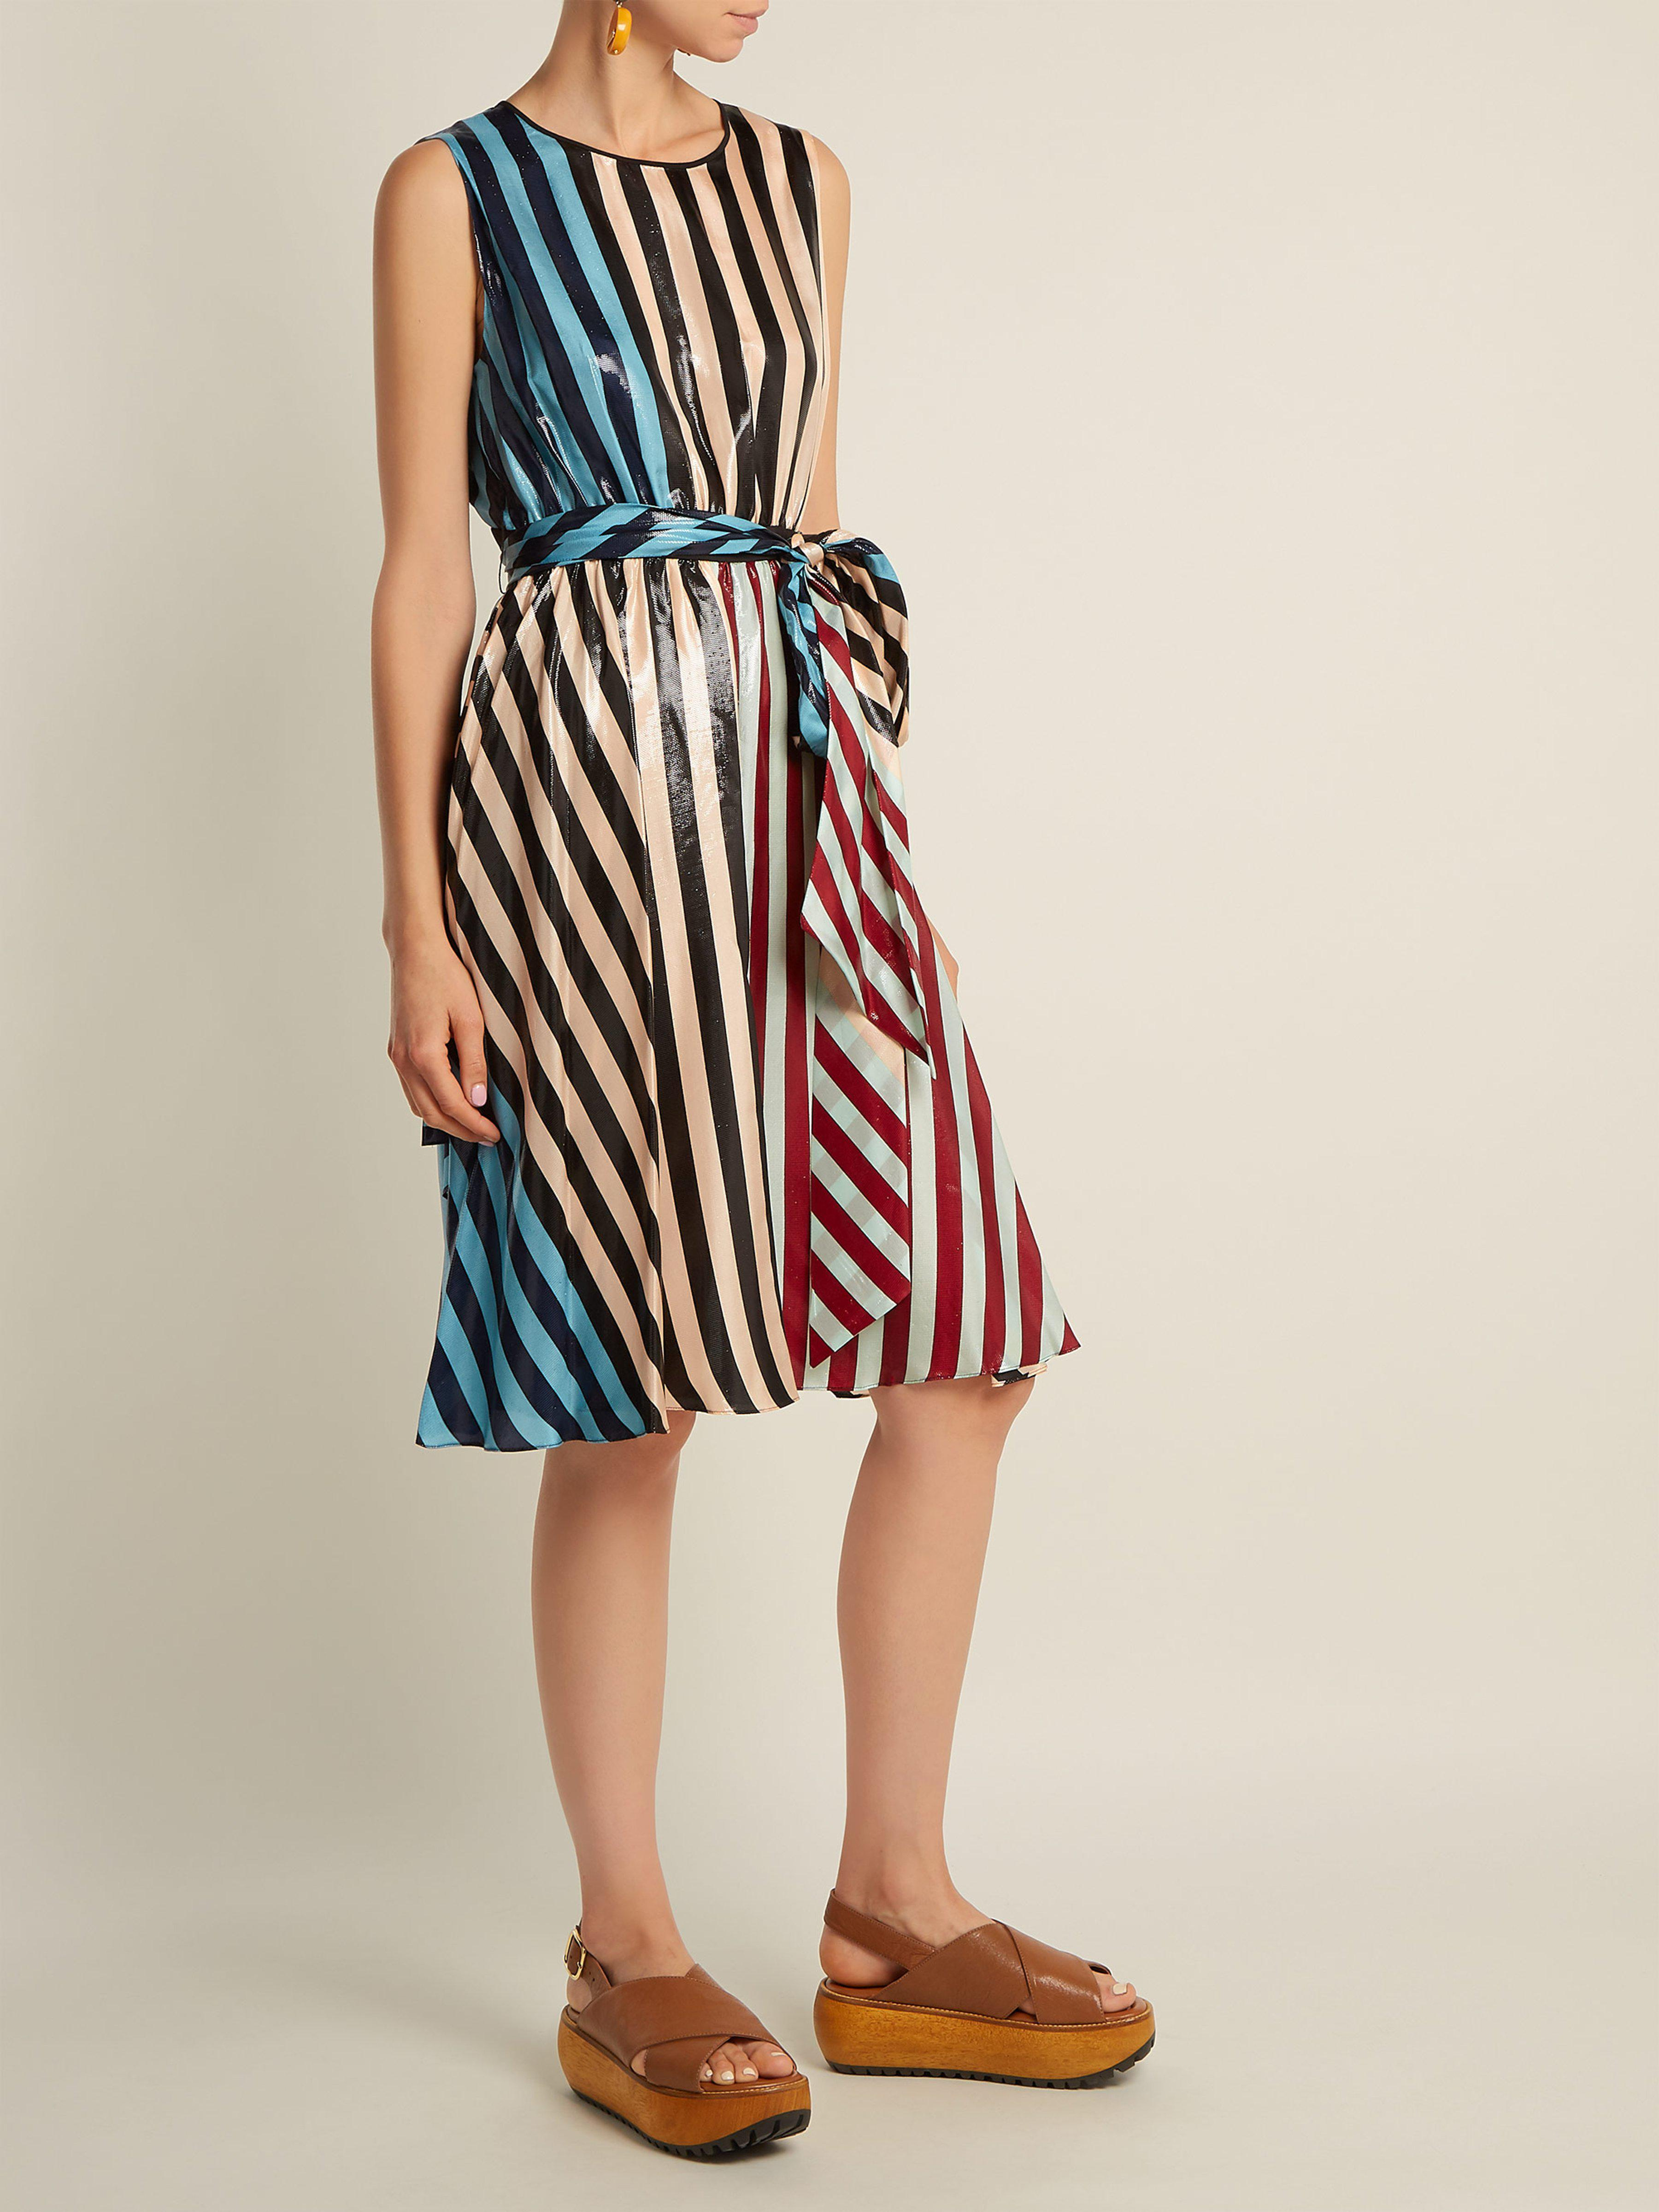 bdc9425b4f5d Diane von Furstenberg Carrington Stripe Silk Blend Dress - Save 60% - Lyst